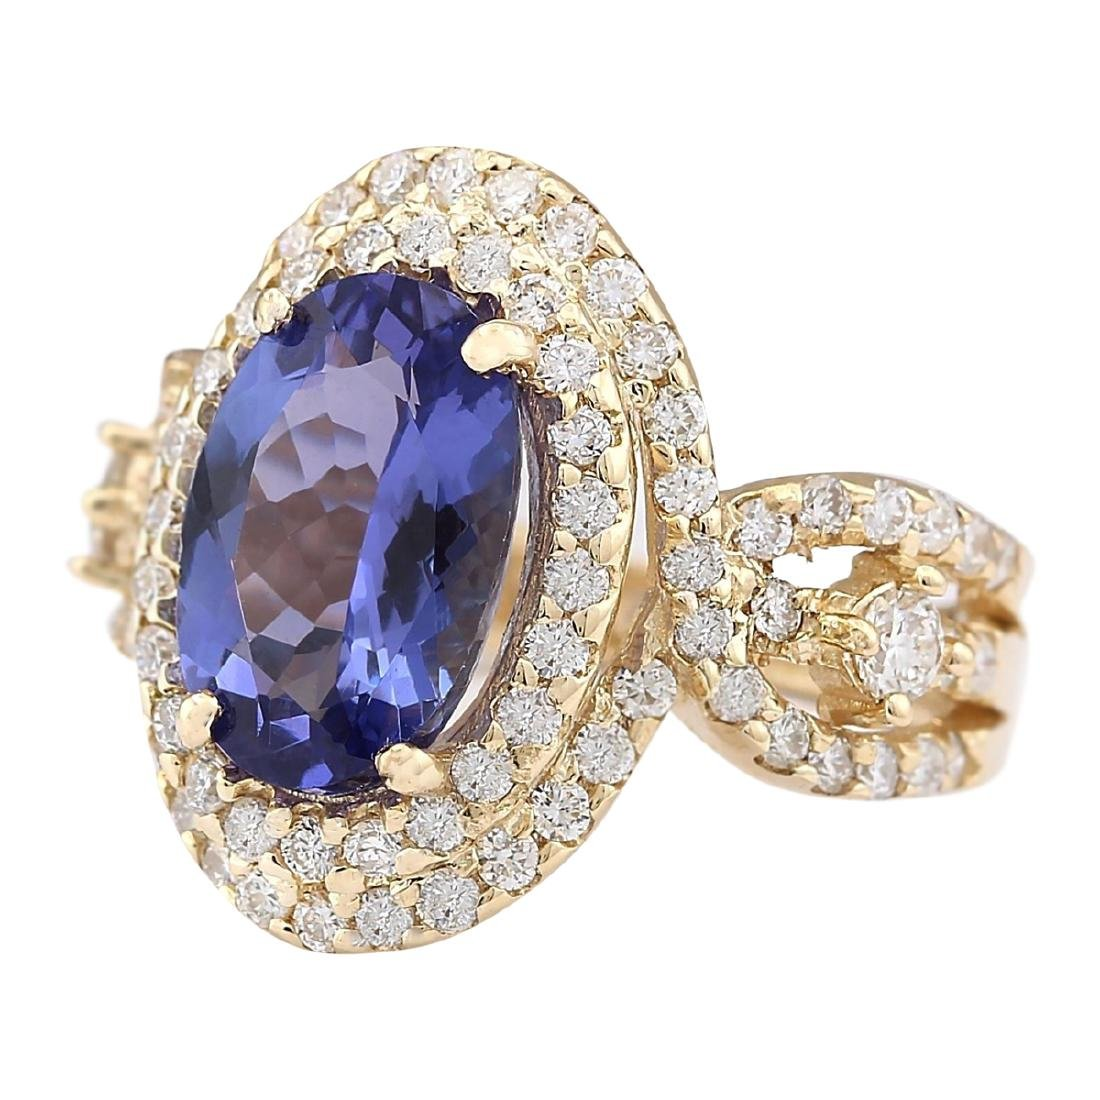 5.11 CTW Natural Tanzanite And Diamond Ring In 18K - 2